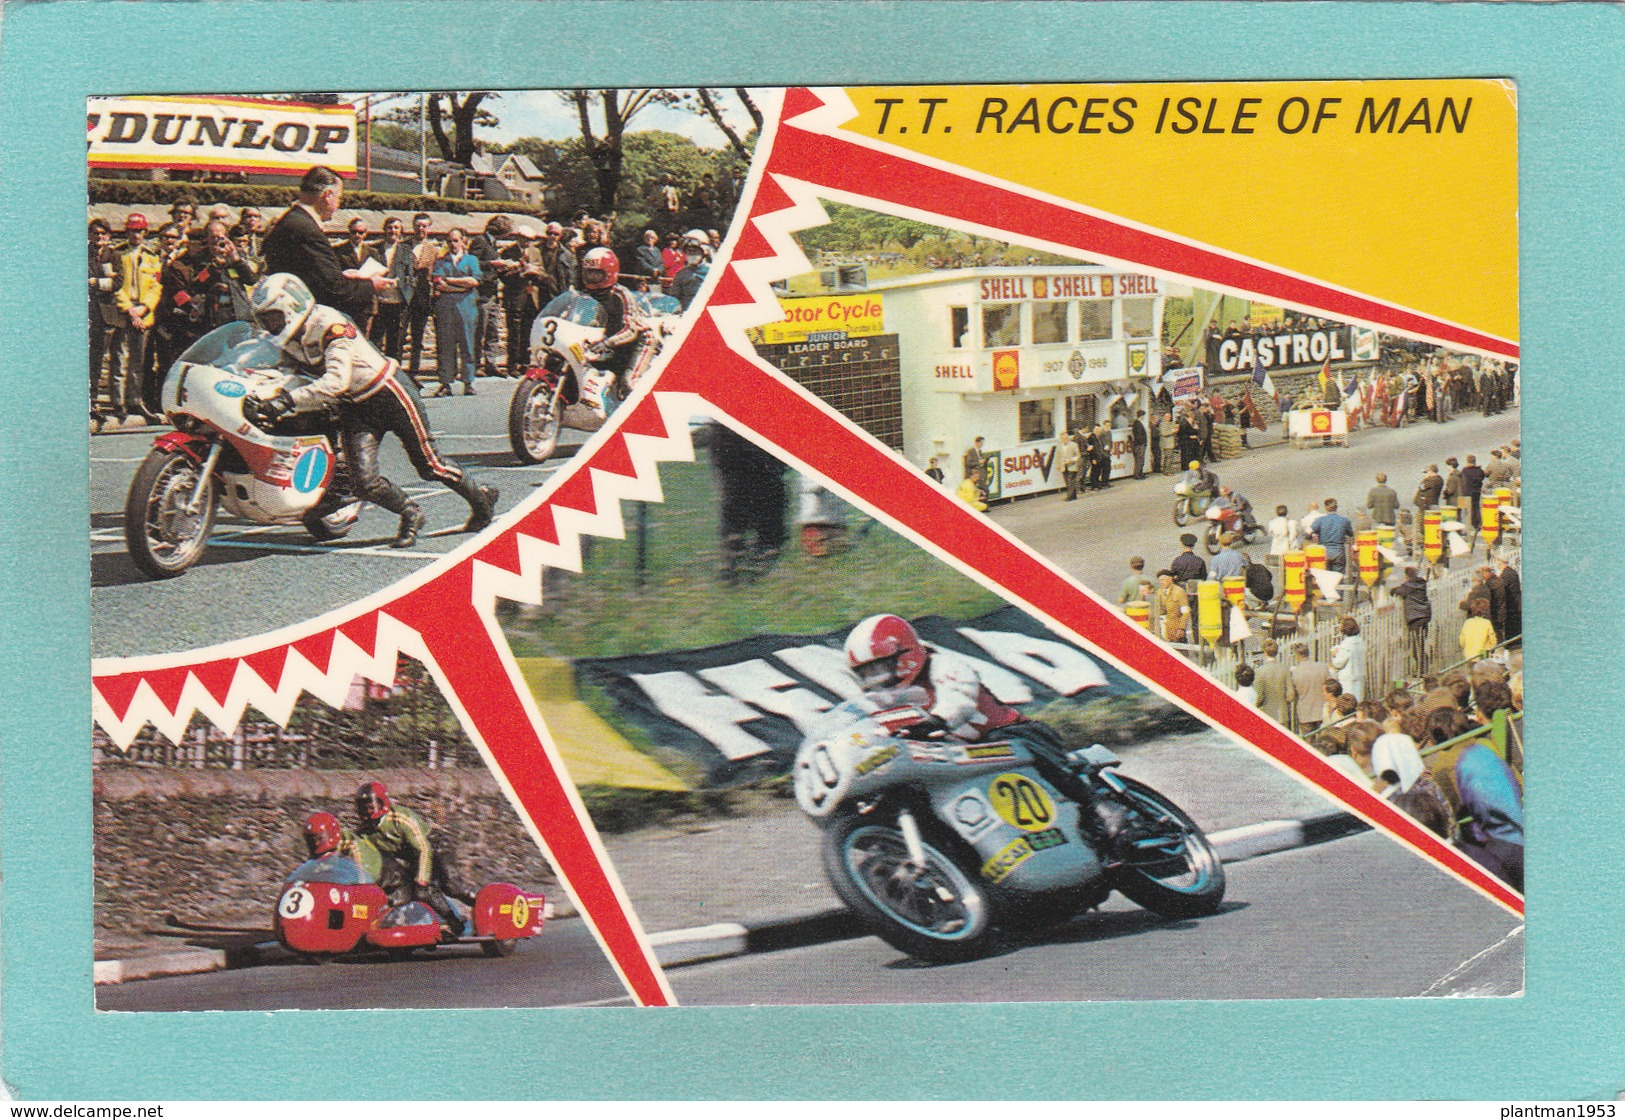 Small Modern Multi View Postcard Of T.T.Races,Isle Of Man.V51. - Isle Of Man